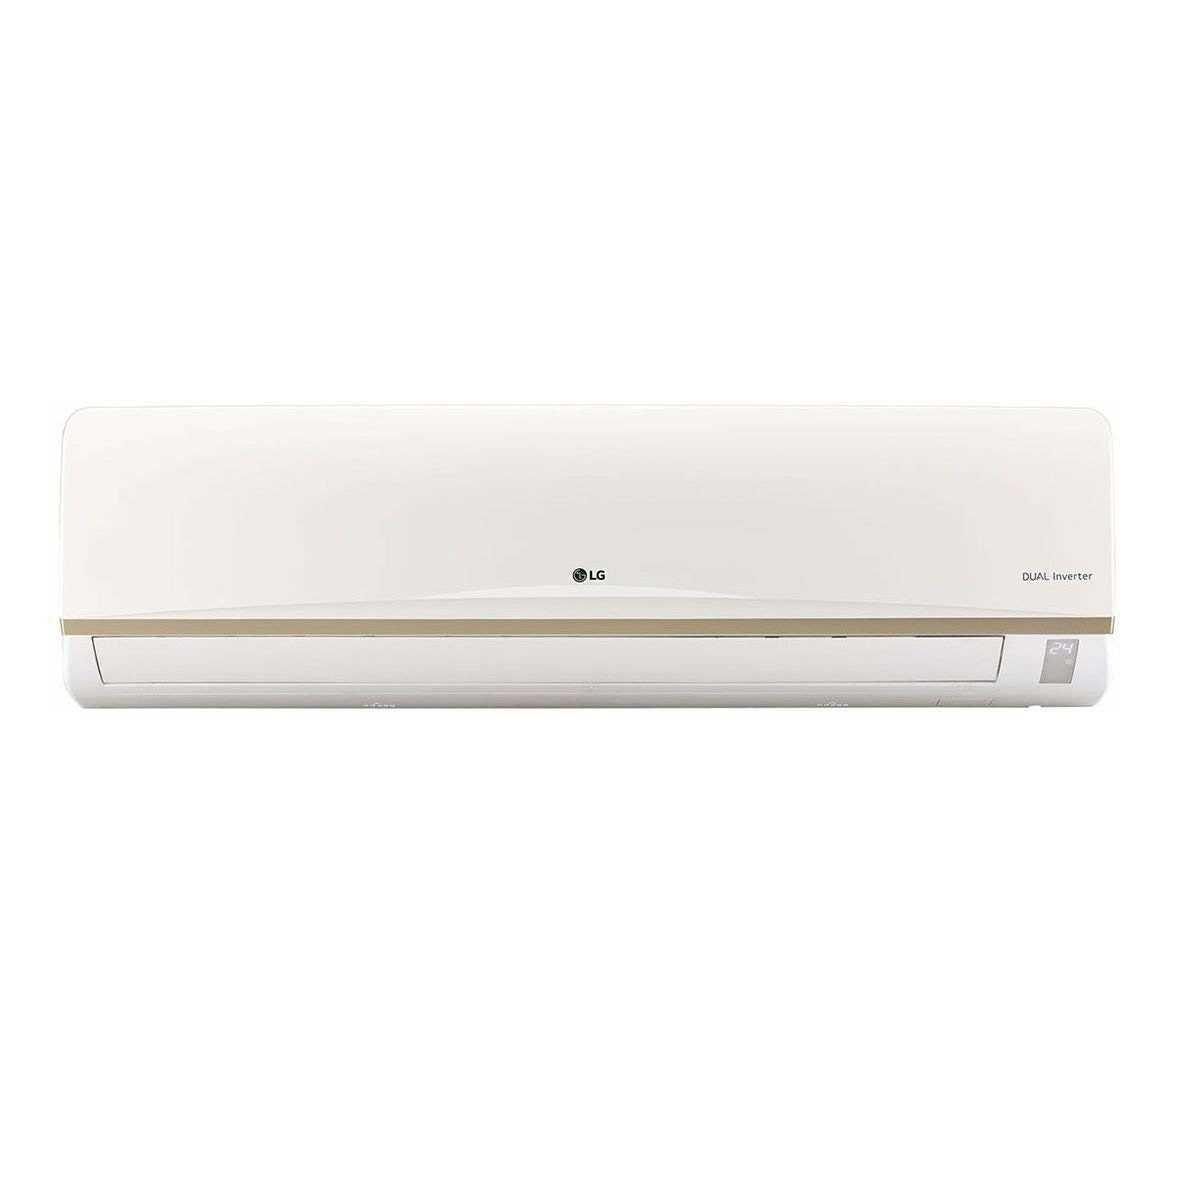 LG JS Q24AUXA1 2 Ton 3 Star Inverter Split AC